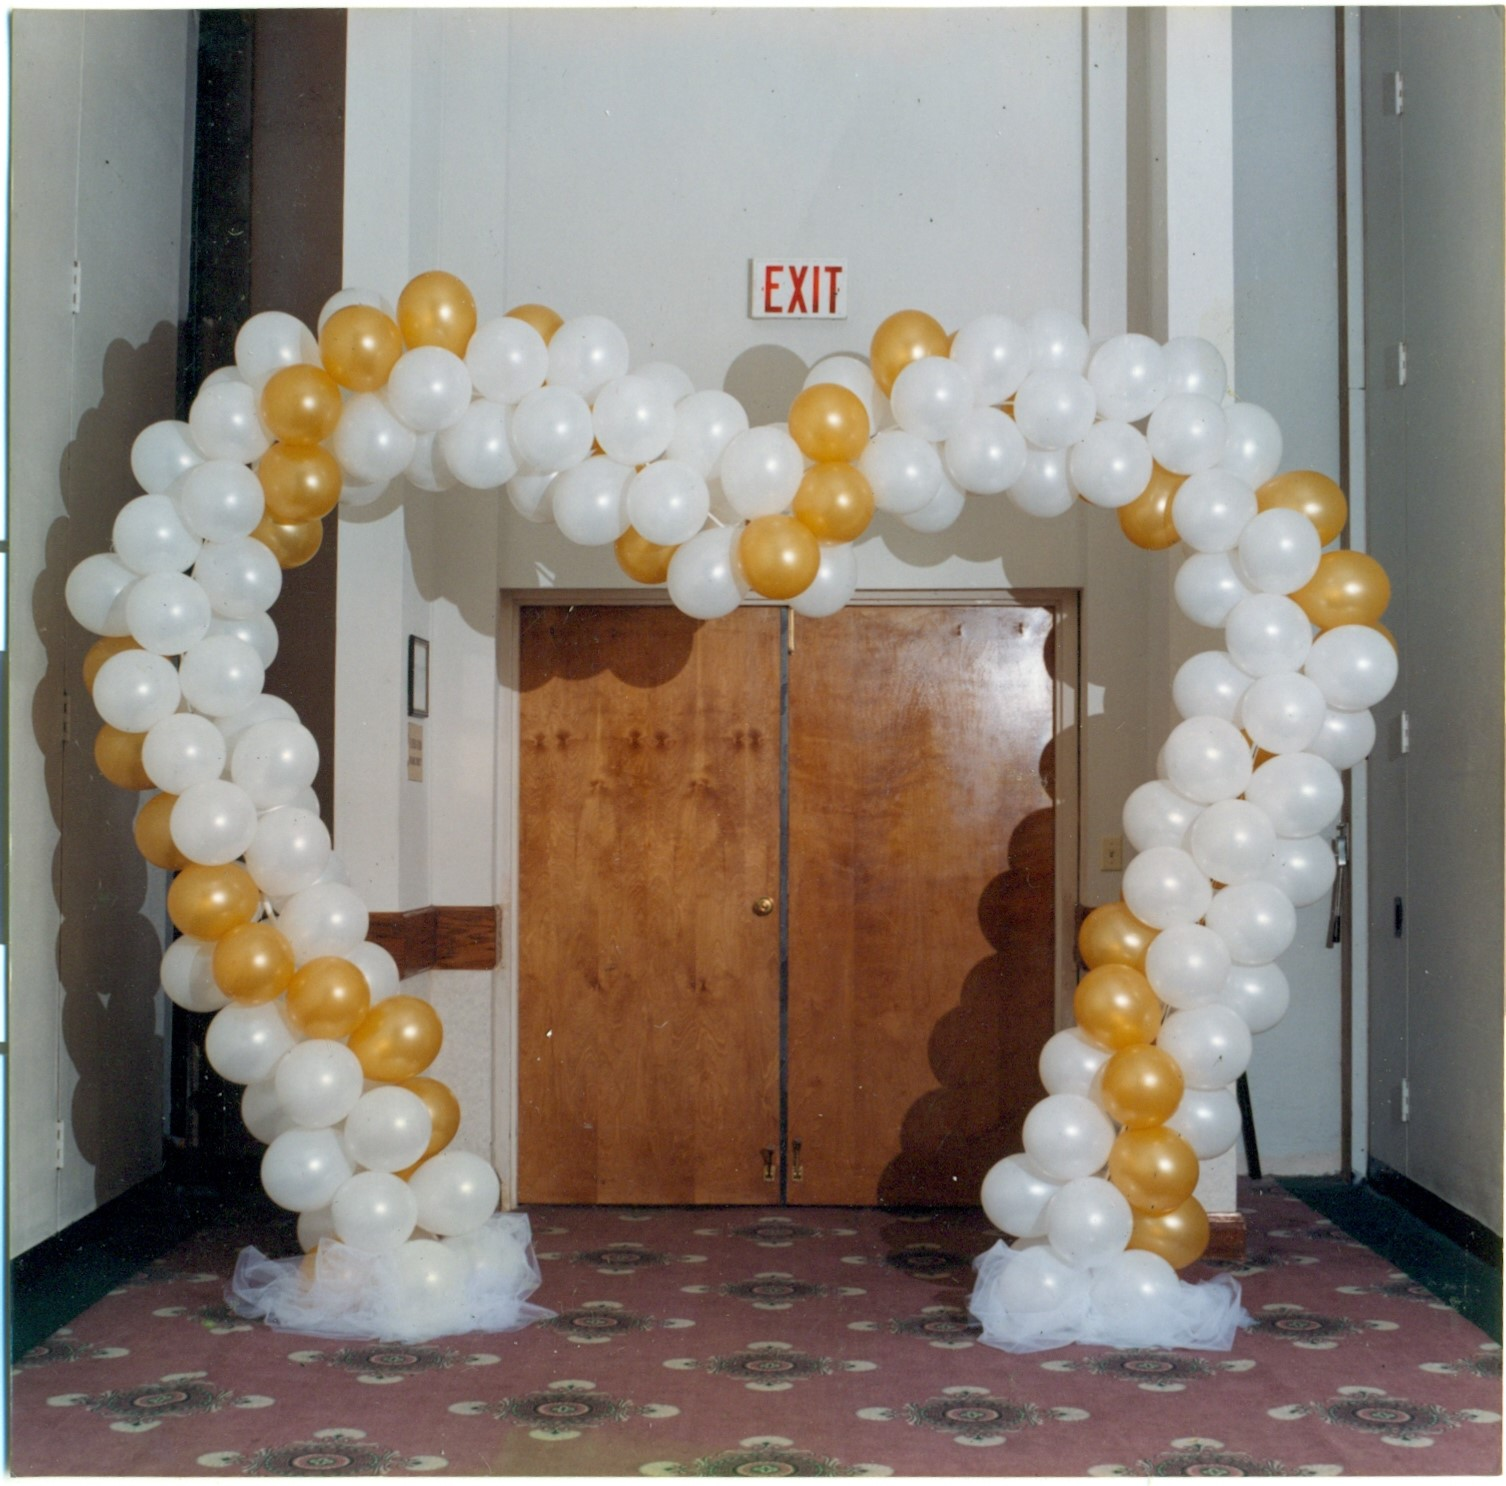 heart entrance0001.jpg